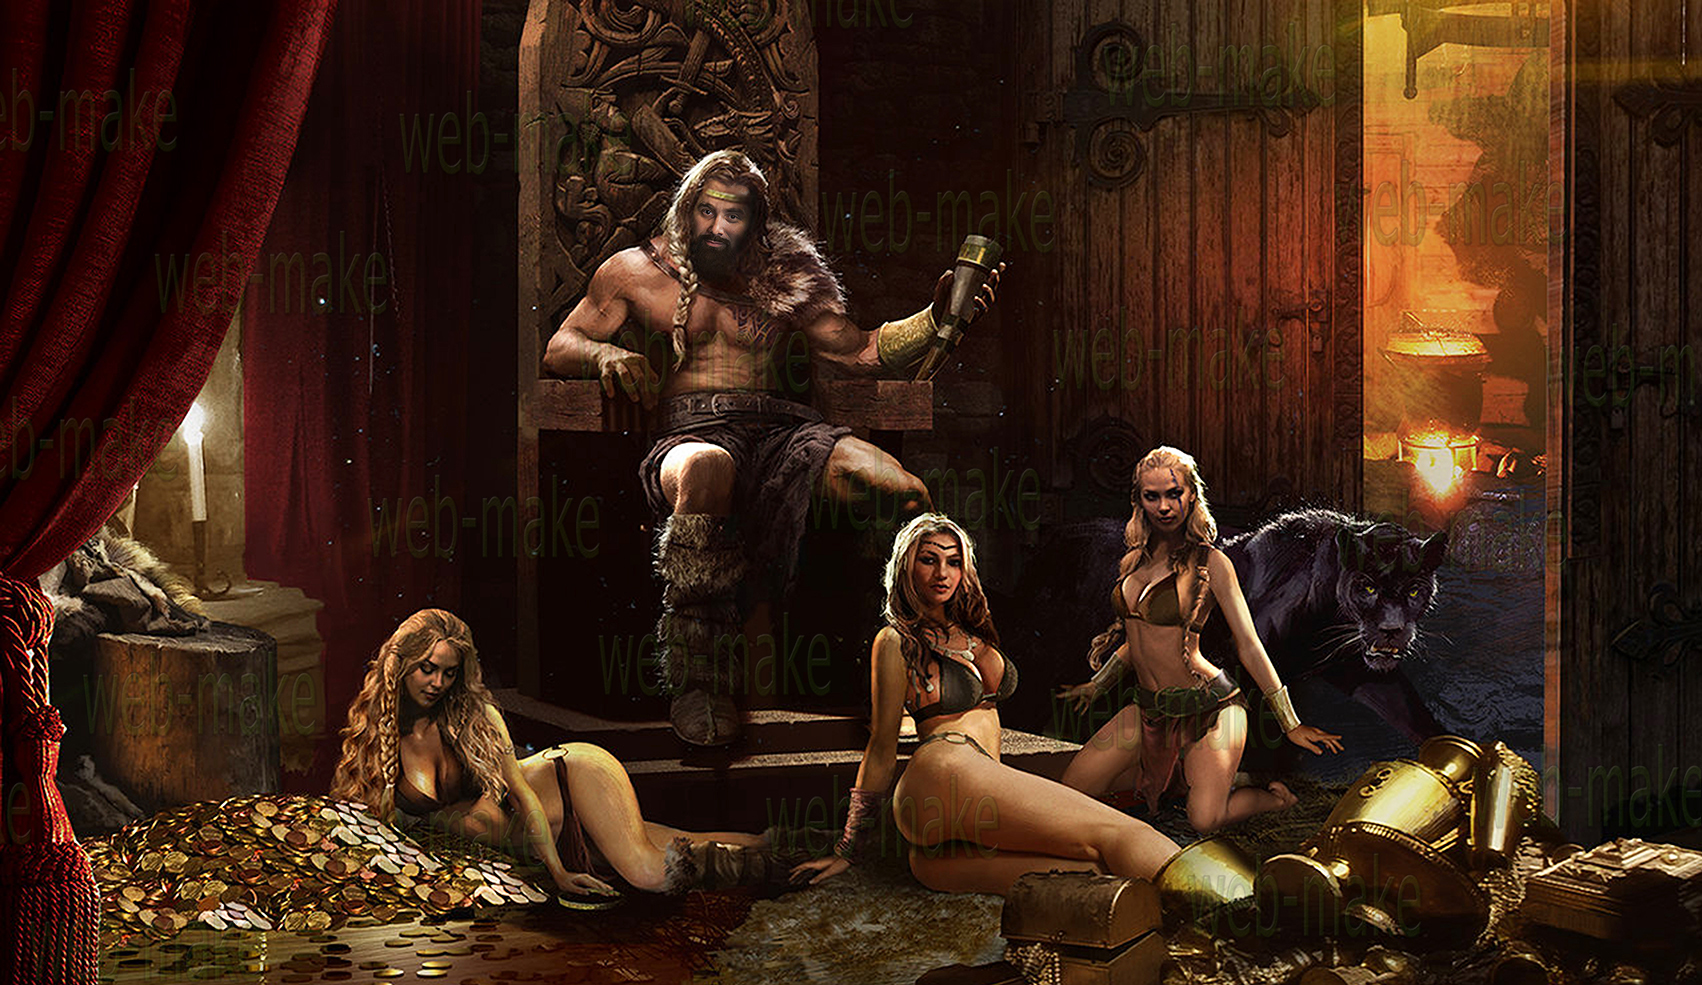 В образе викинга